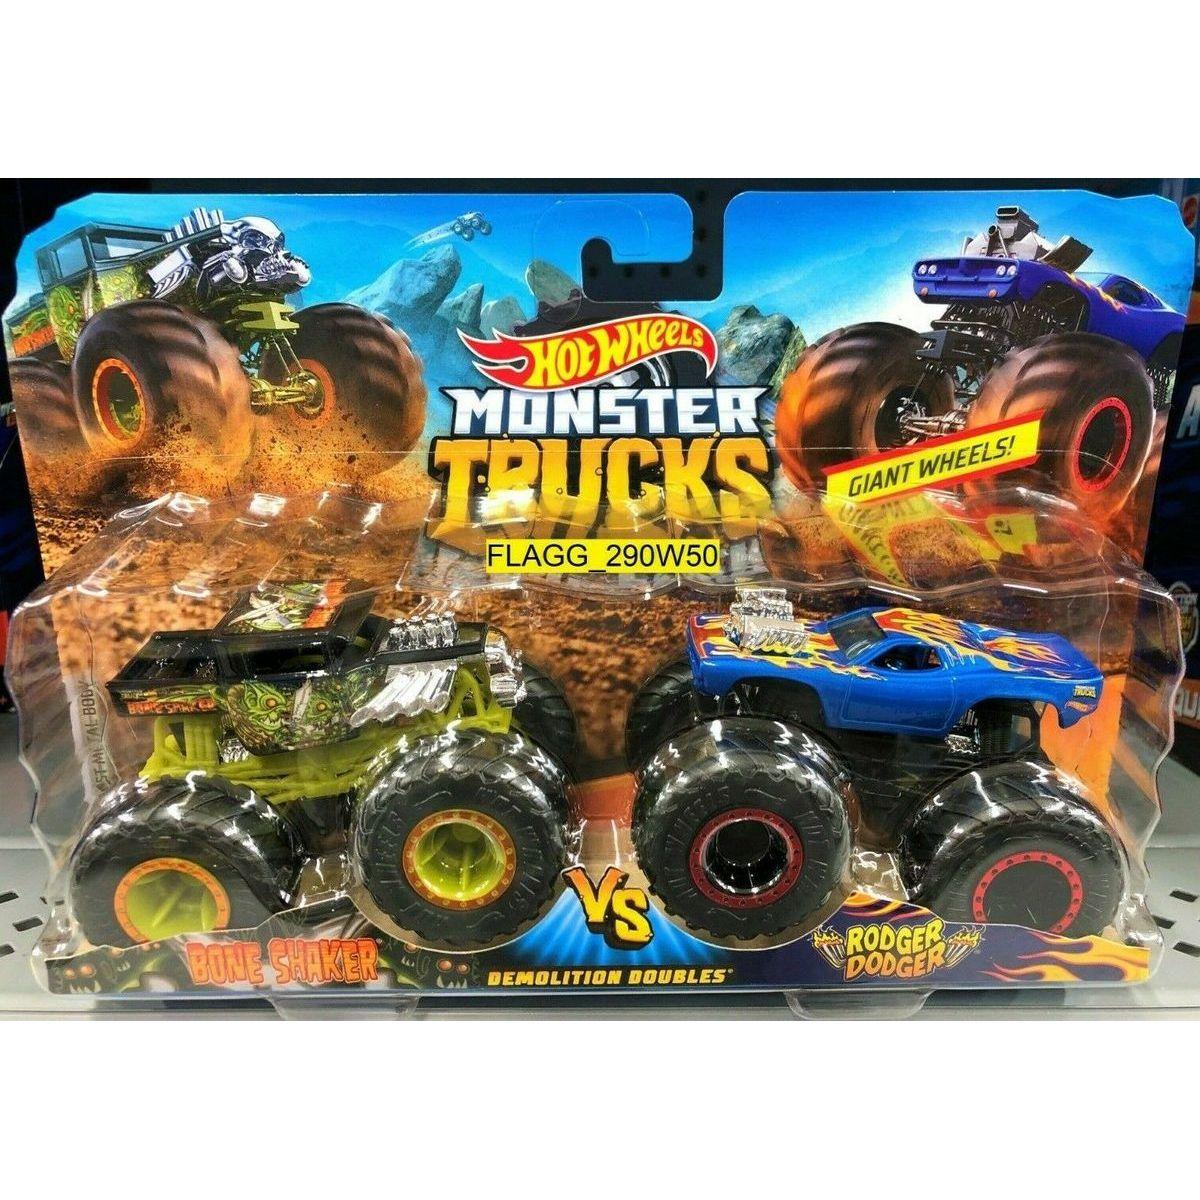 Mattel Hot Wheels Monster trucks demoliční duo Bone Shaker VS Rodger Dodger